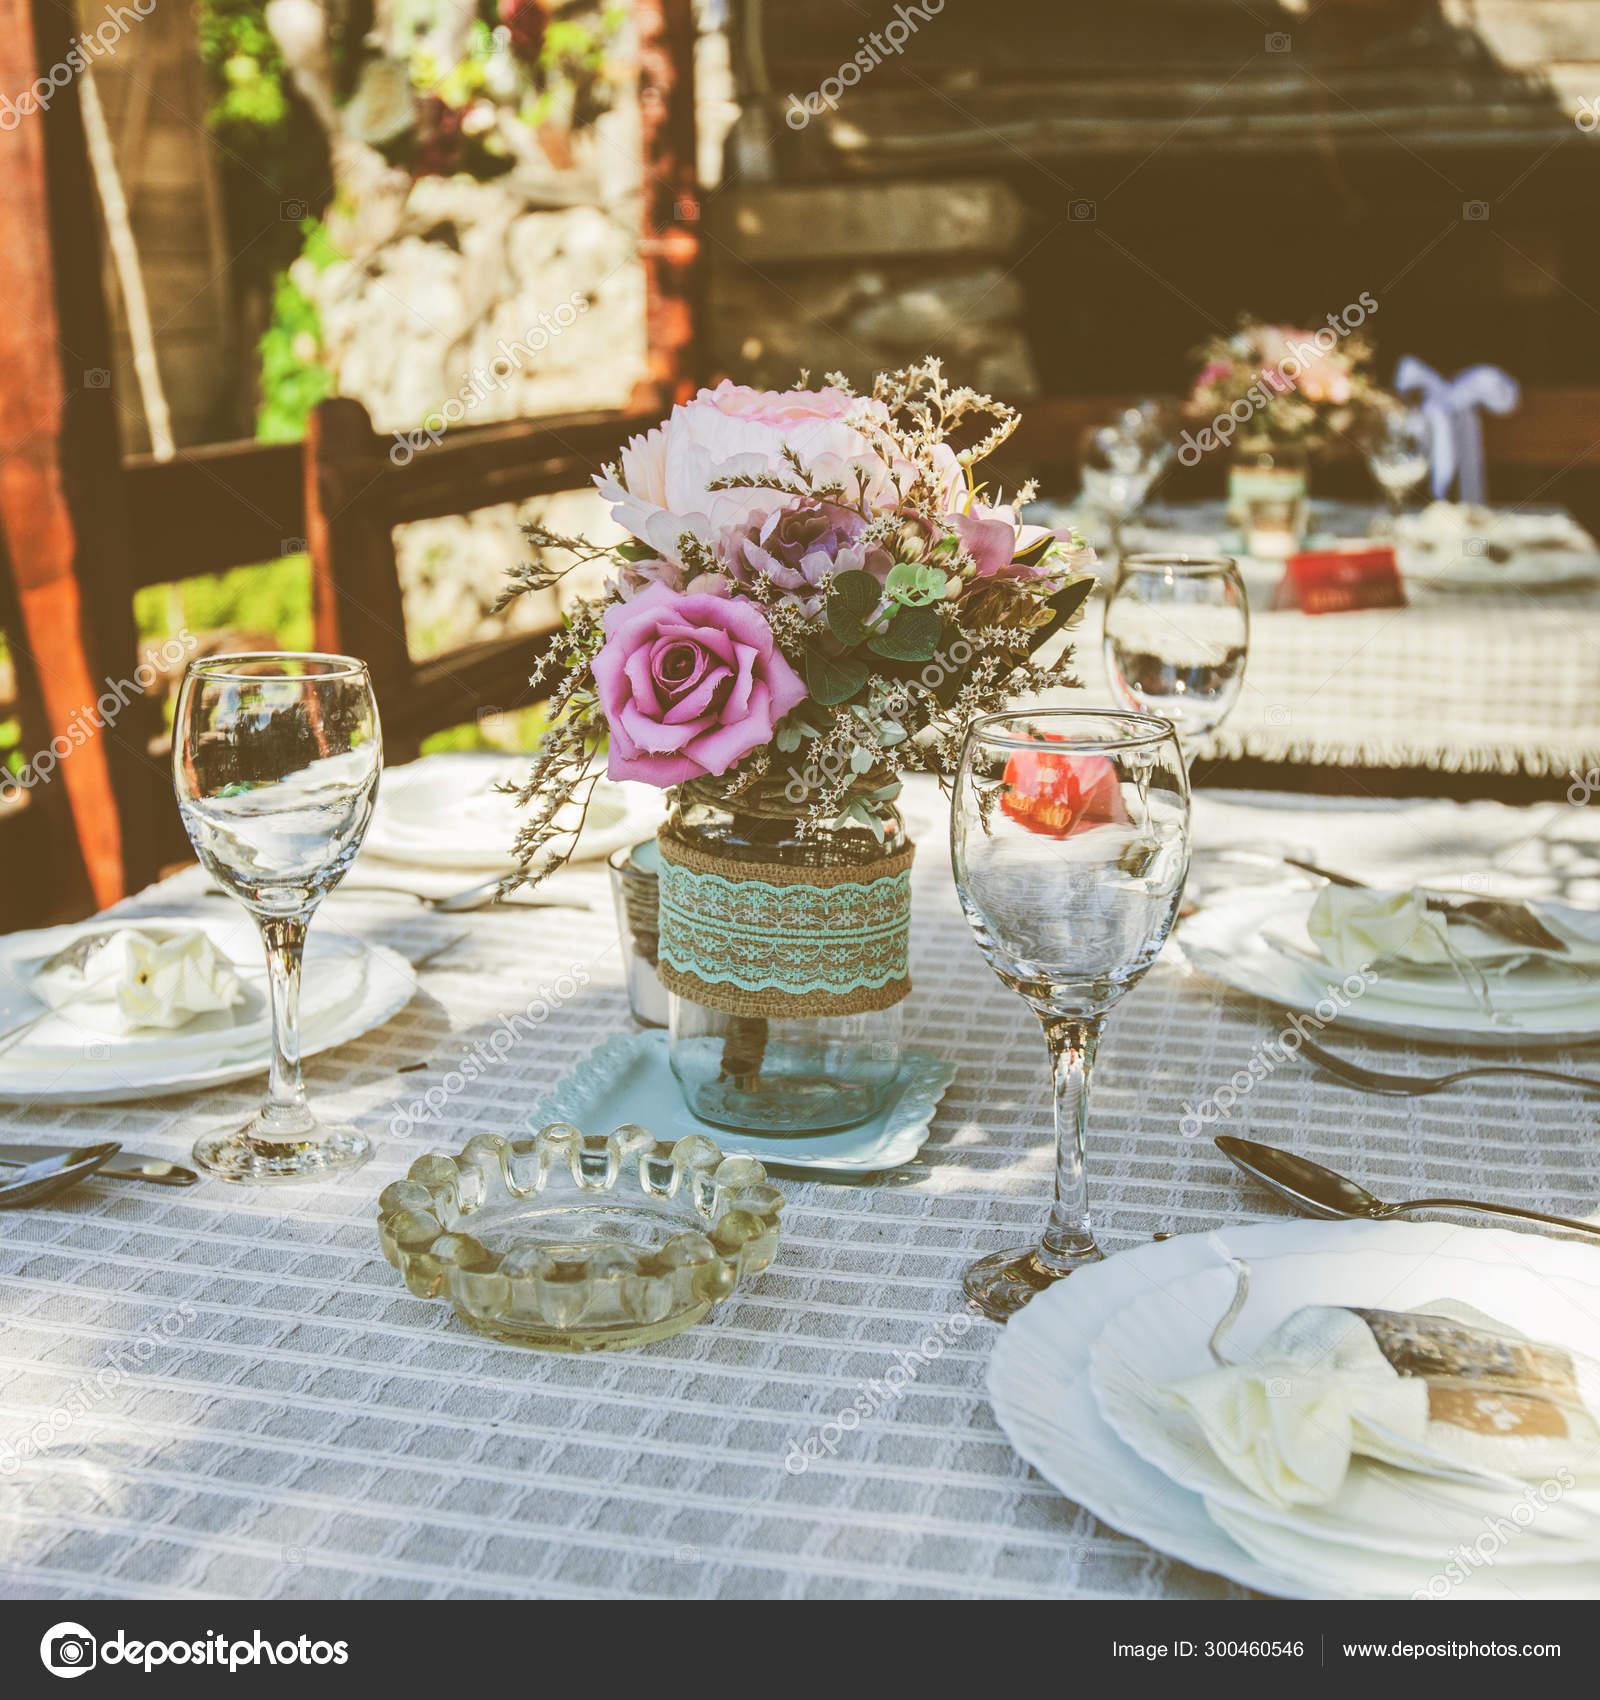 Rustic Style Wedding Table Setting In Restaurant Stock Photo C Mitastockimages 300460546